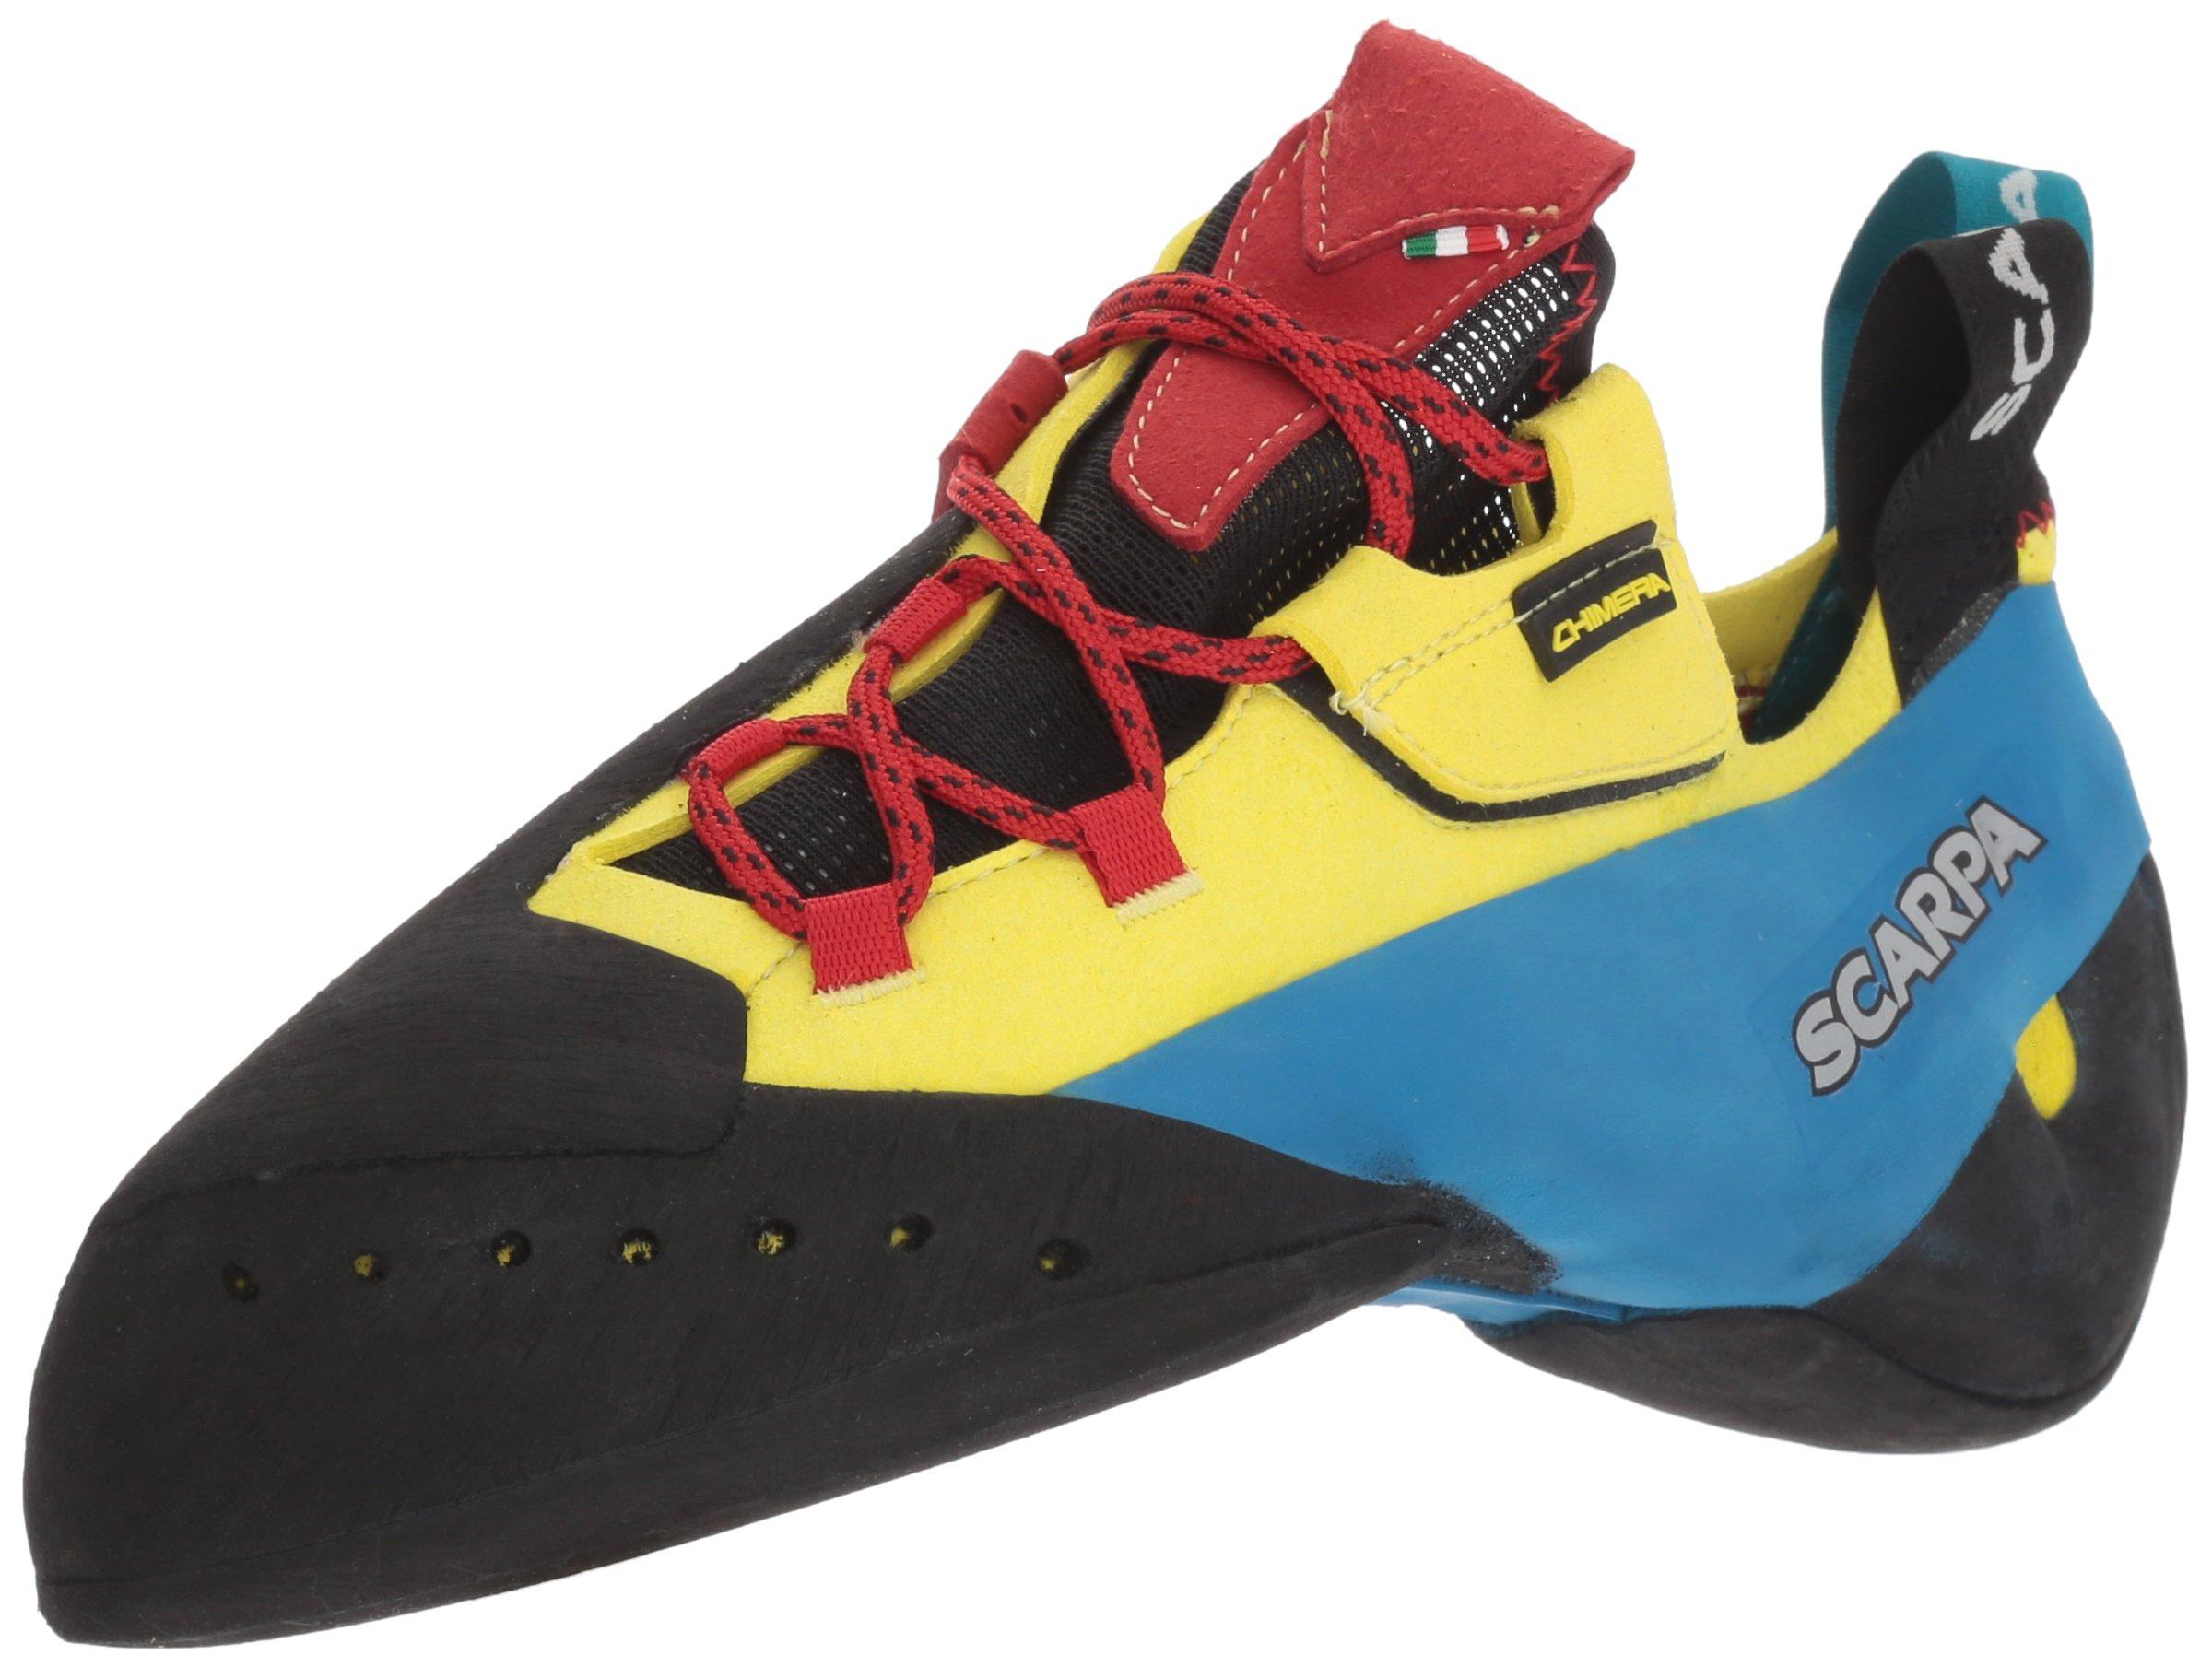 SCARPA Chimera Rock Shoe Climbing, Yellow, 43.5 EU/10 1/3 M US by SCARPA